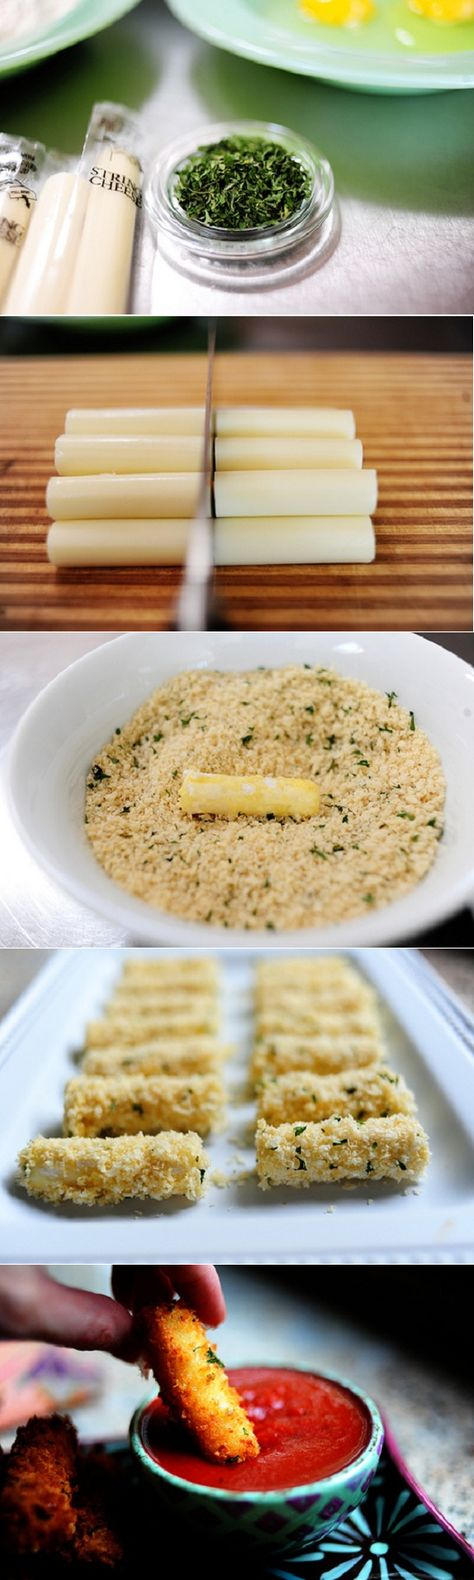 panko bread crumbs mozzarella sticks.